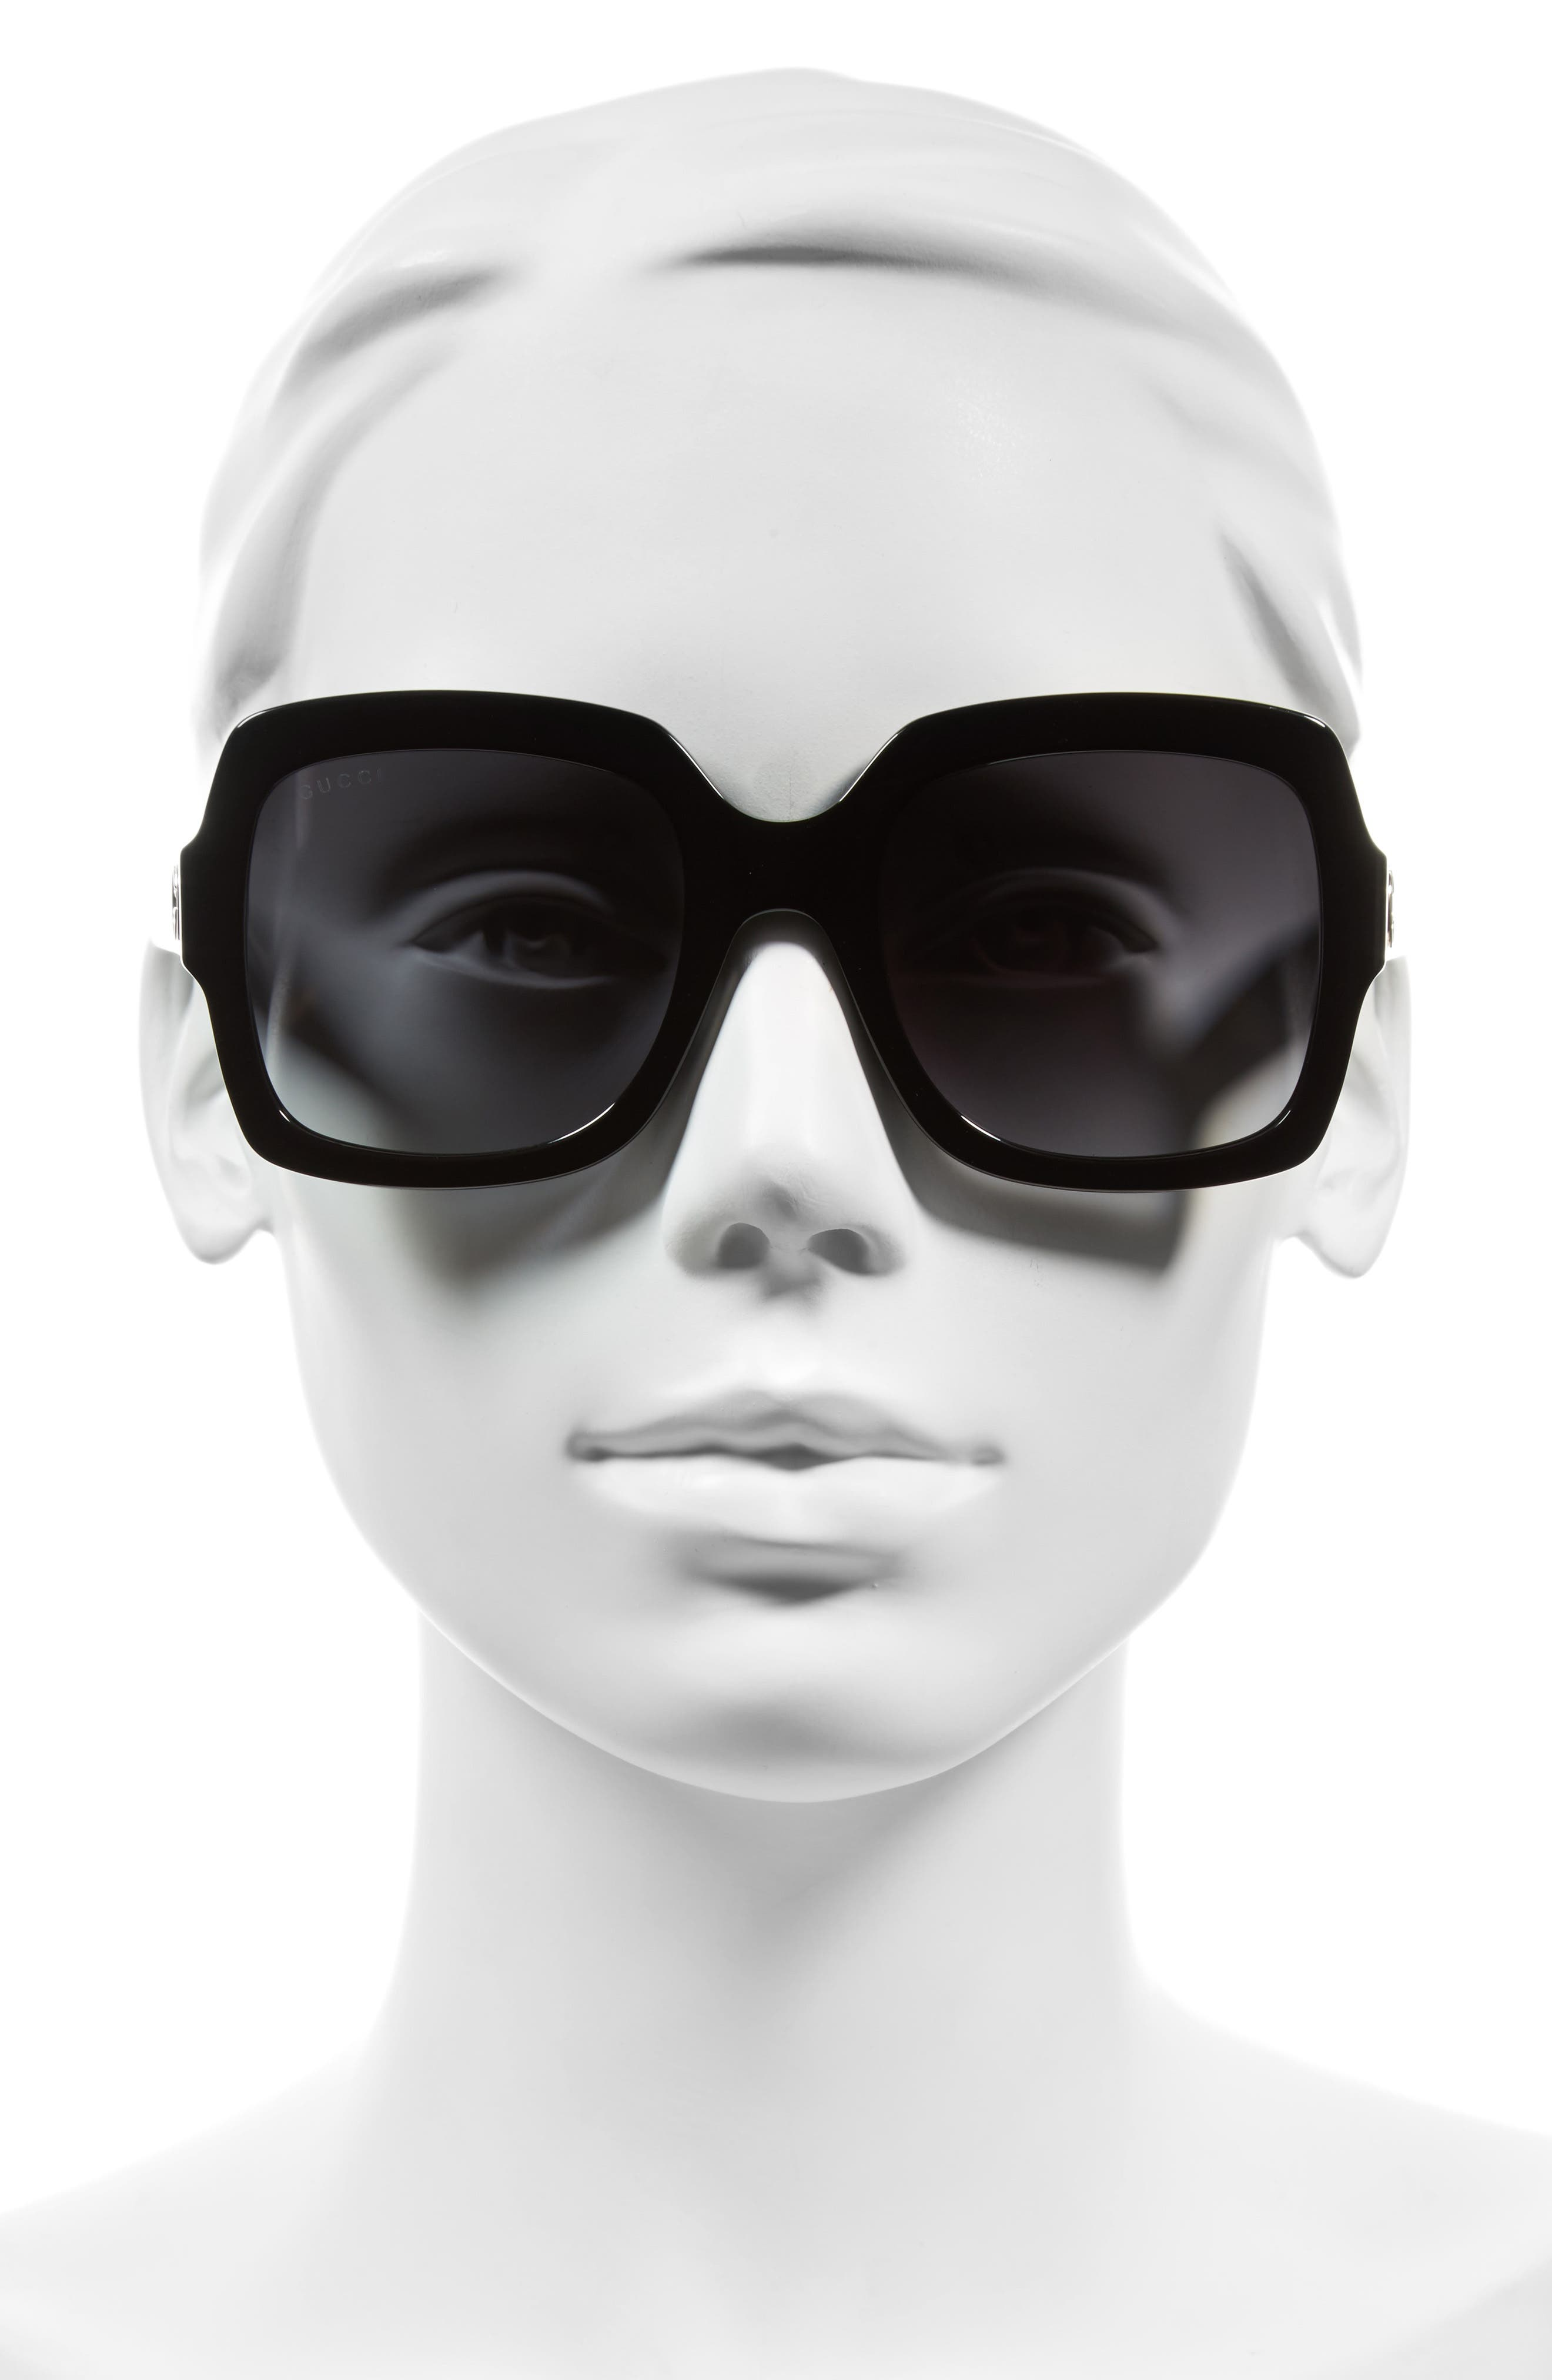 54mm Square Sunglasses,                             Alternate thumbnail 2, color,                             BLACK/ GREY